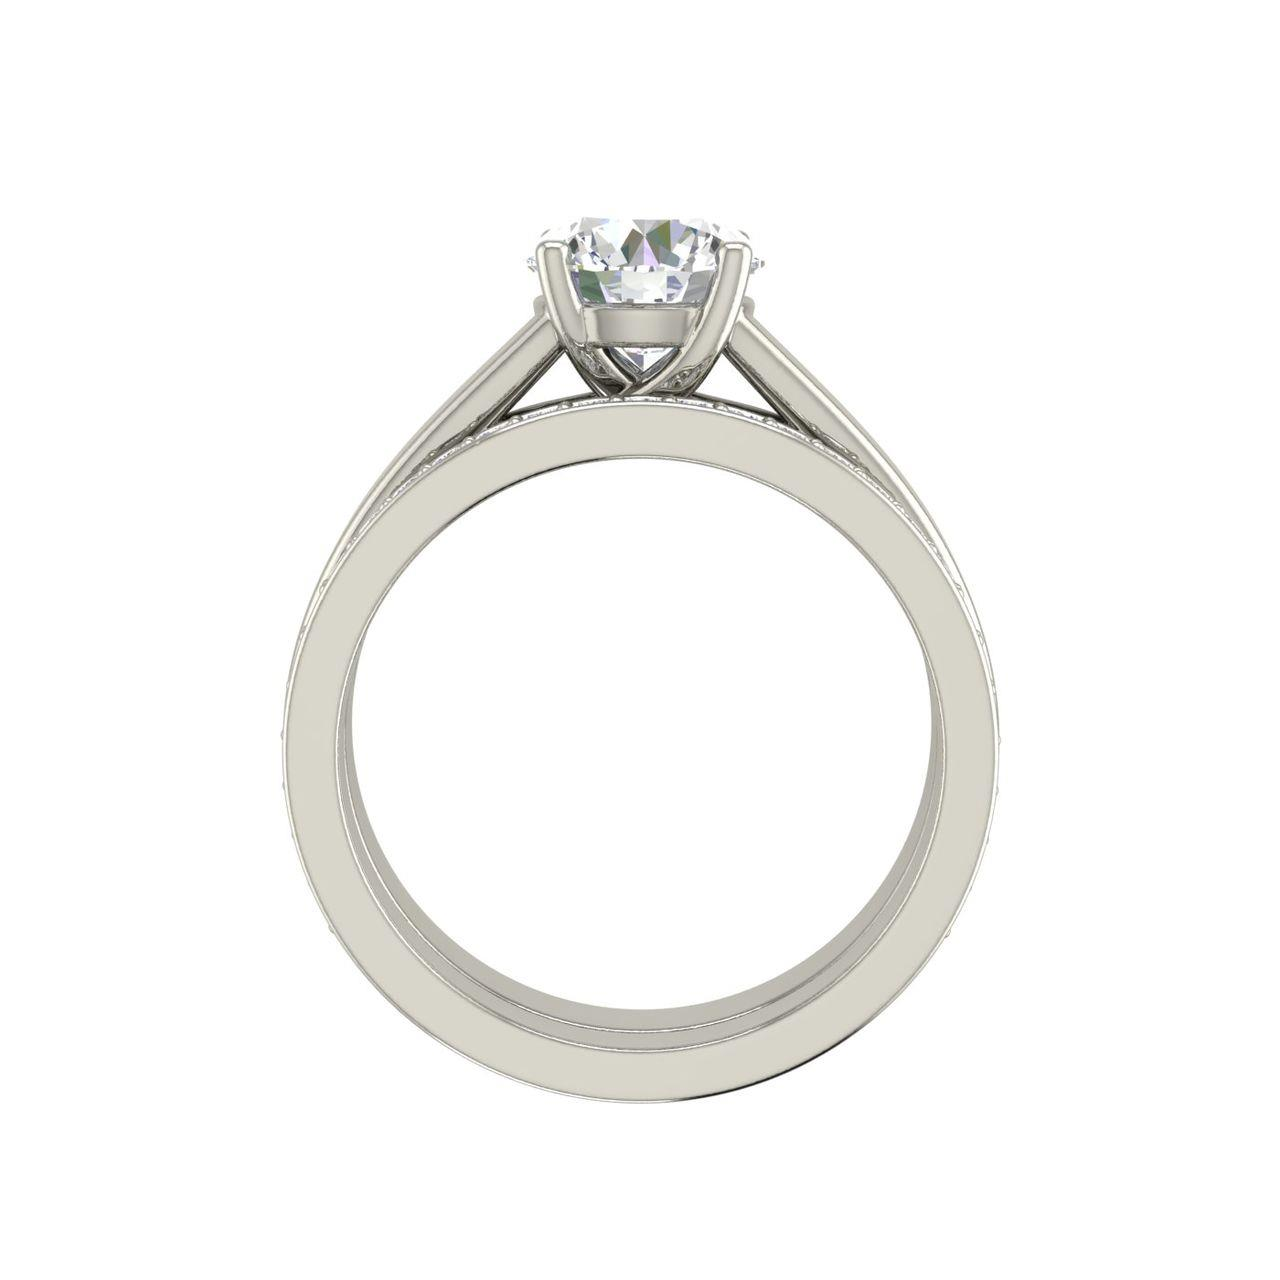 Channel Set 1.25 Carat Round Cut Diamond Engagement Ring